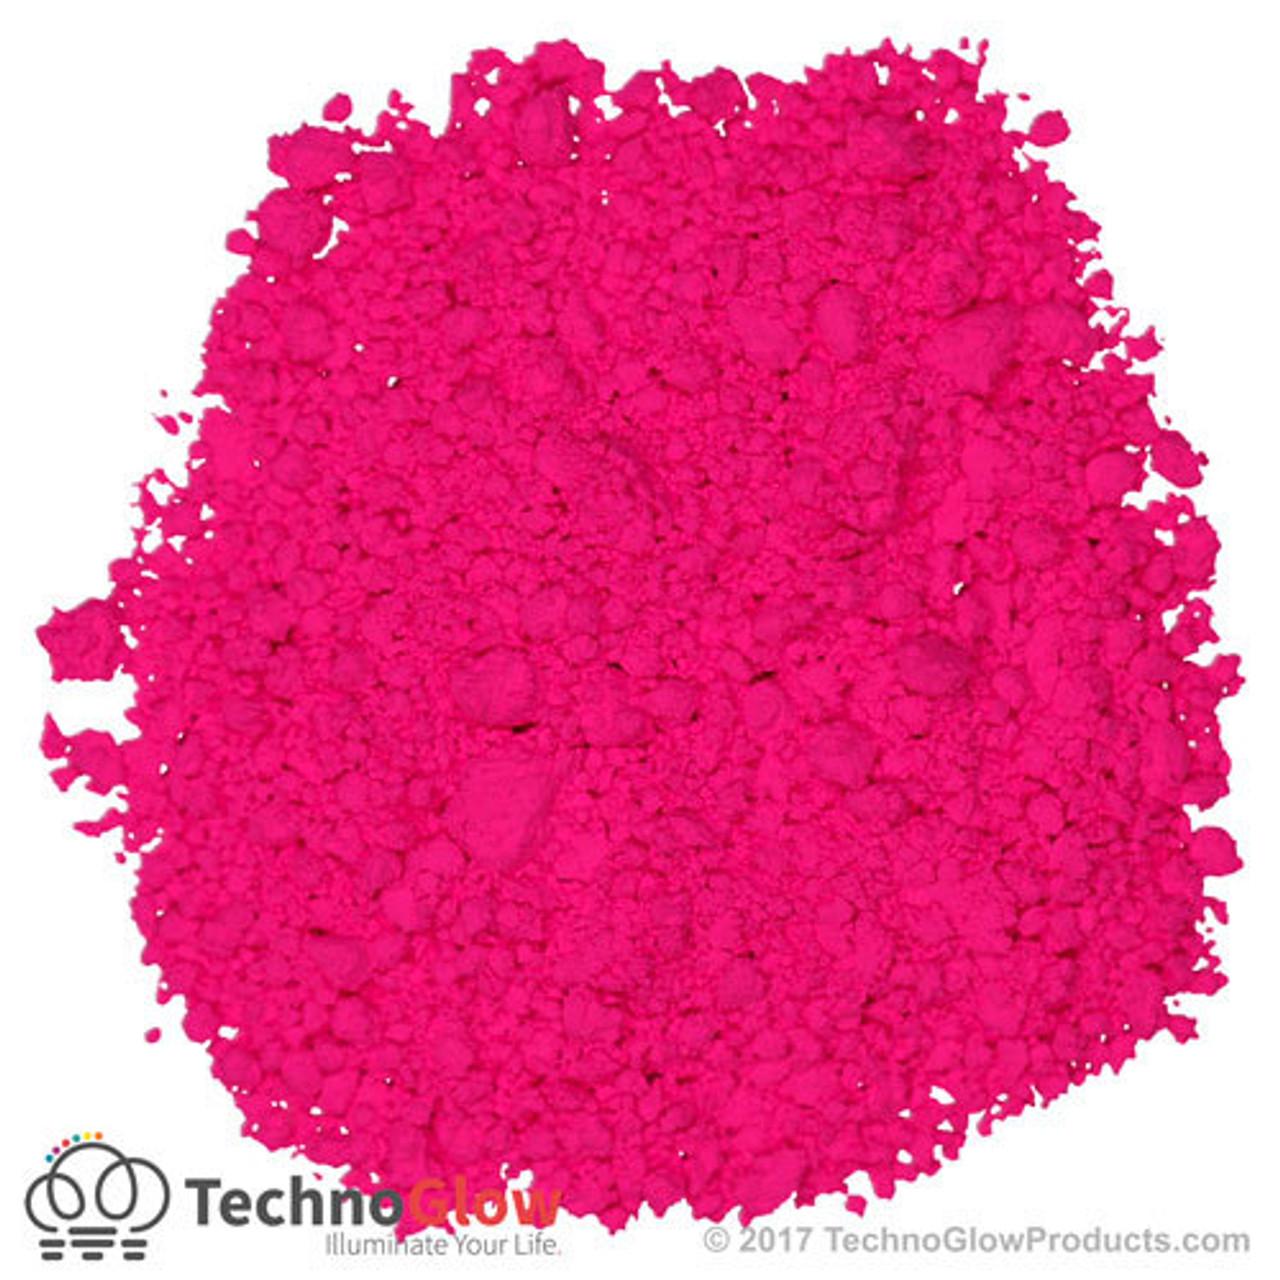 MAGENTA Fluorescent Powder UV Reactive Powder Pigment